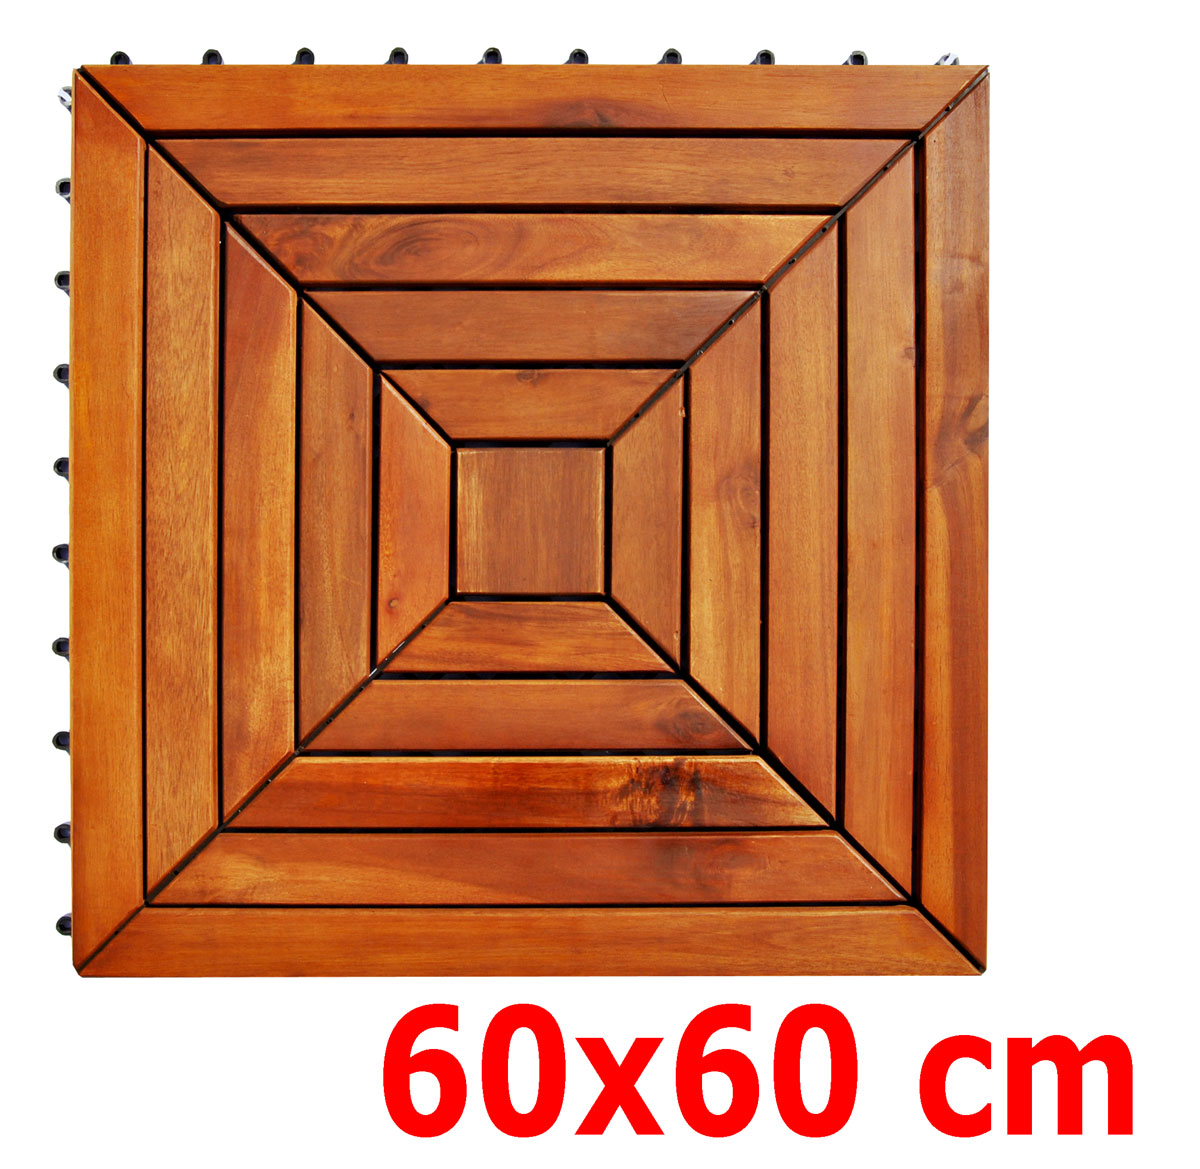 Xxl 60x60 holzfliesen terrasssenfliesen balkonfliese for Fenster 60x60